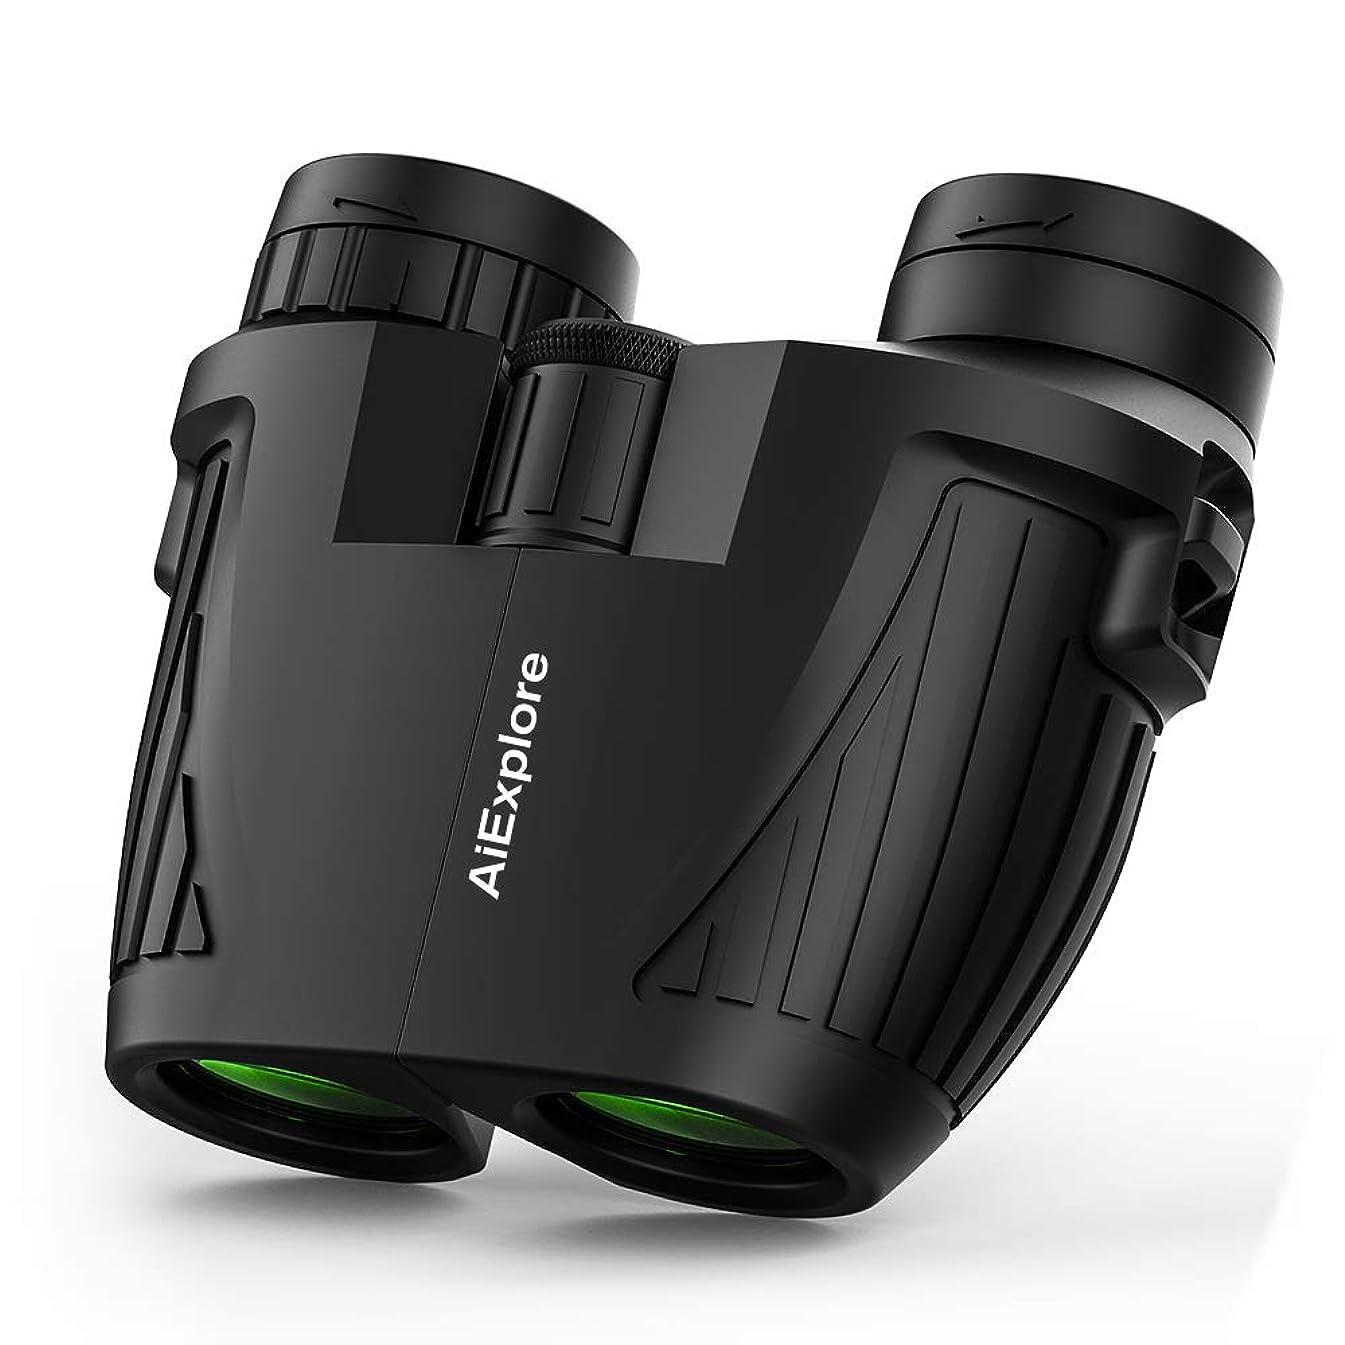 12x25 Compact Pocket Folding Binoculars for Adults/Kids, Low Light Night Vision Large Eyepiece High Power Waterproof Mini Lightweight Binoculars Easy Focus for Outdoor Hunting, Bird Watching, Hiking